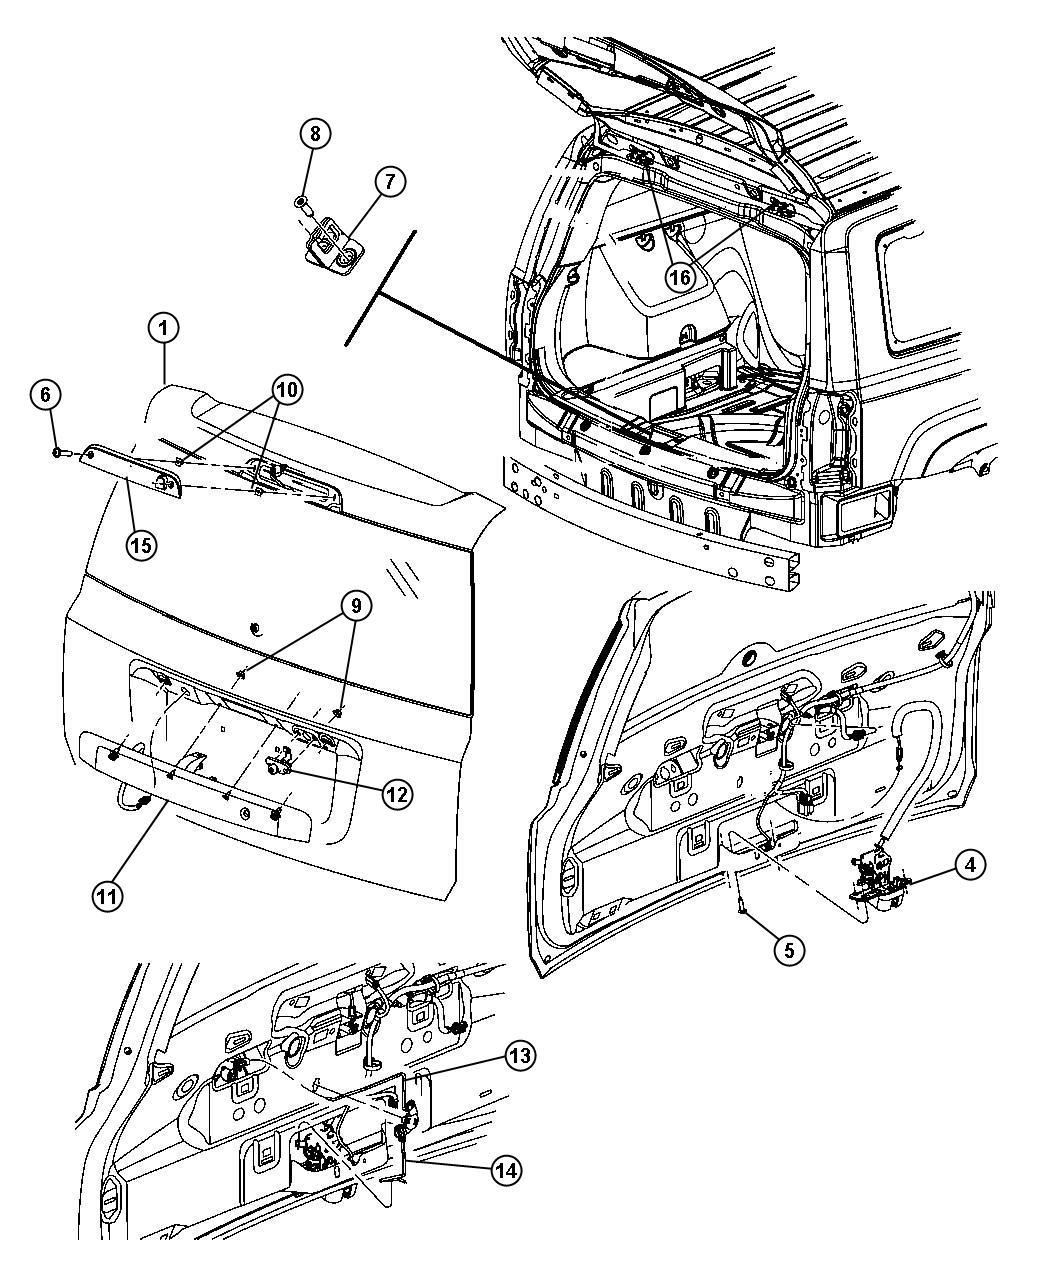 Jeep Patriot Link. Key cylinder to latch. Manual, locks